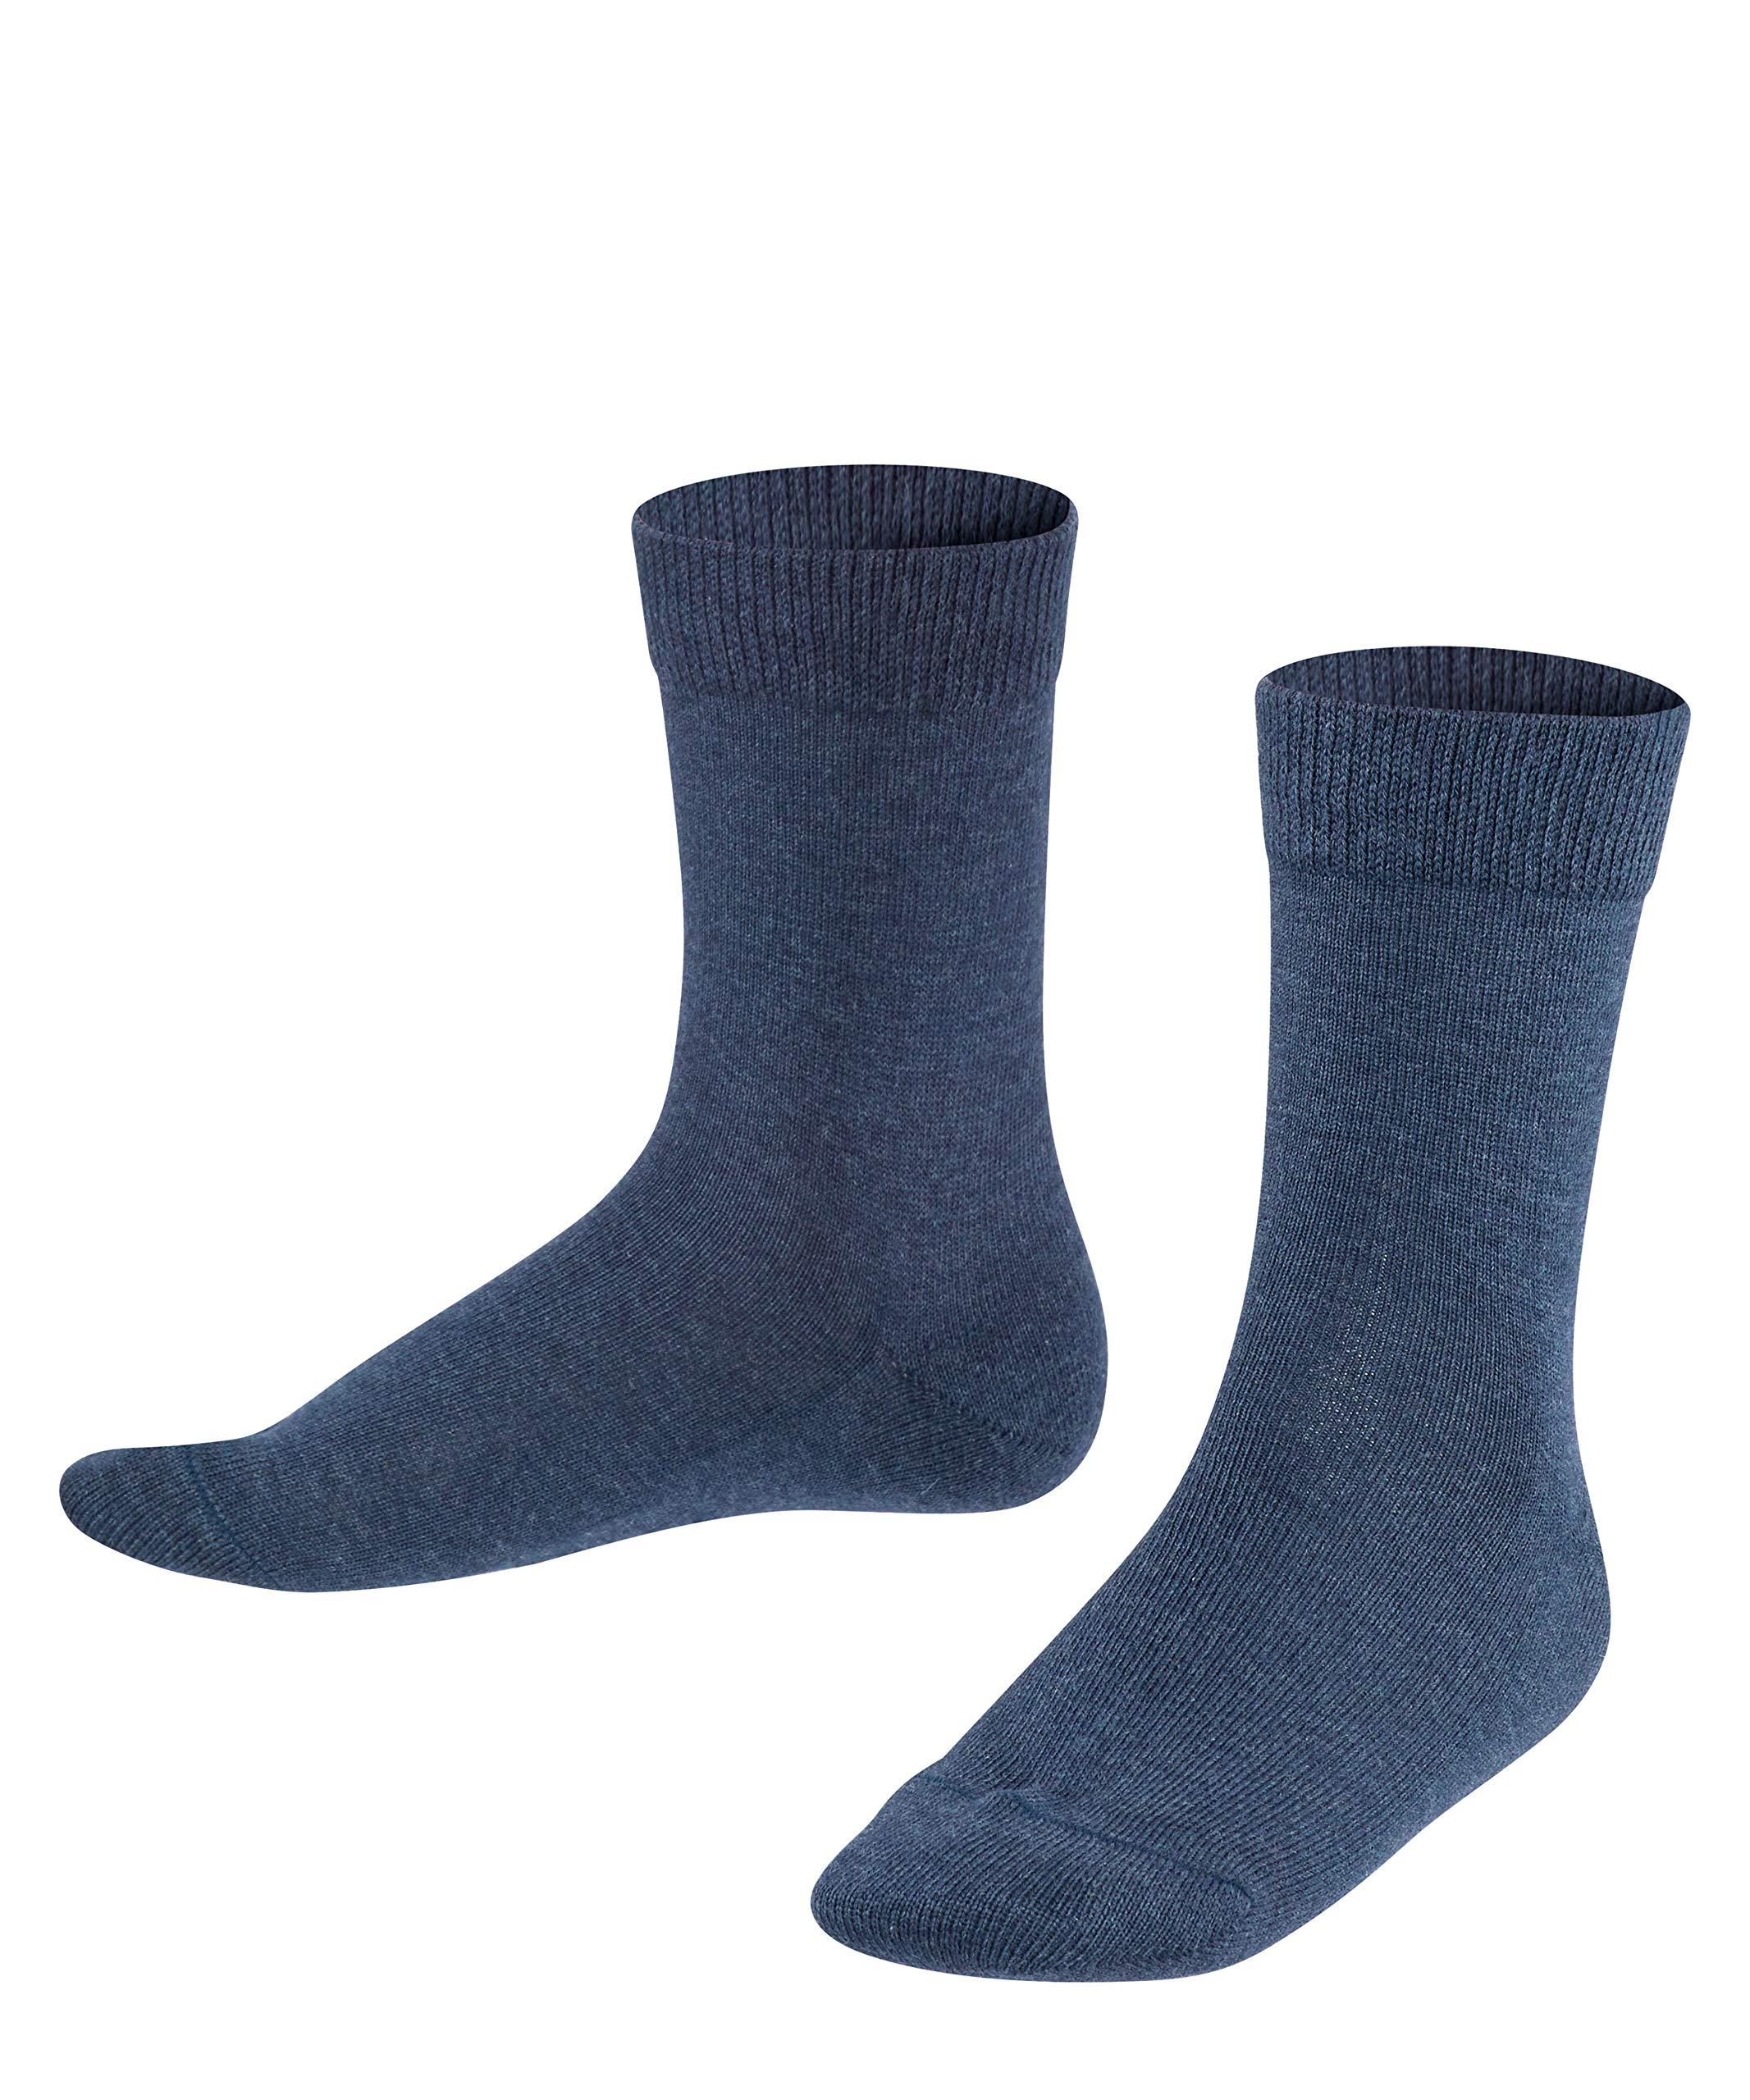 FALKE Unisex Kids Family Socks Cotton Black Grey More Colours Thin Calf Socks For Boys Or Girls Classic All Seasons Plain Pattern For School Or Casual Looks 1 Pair